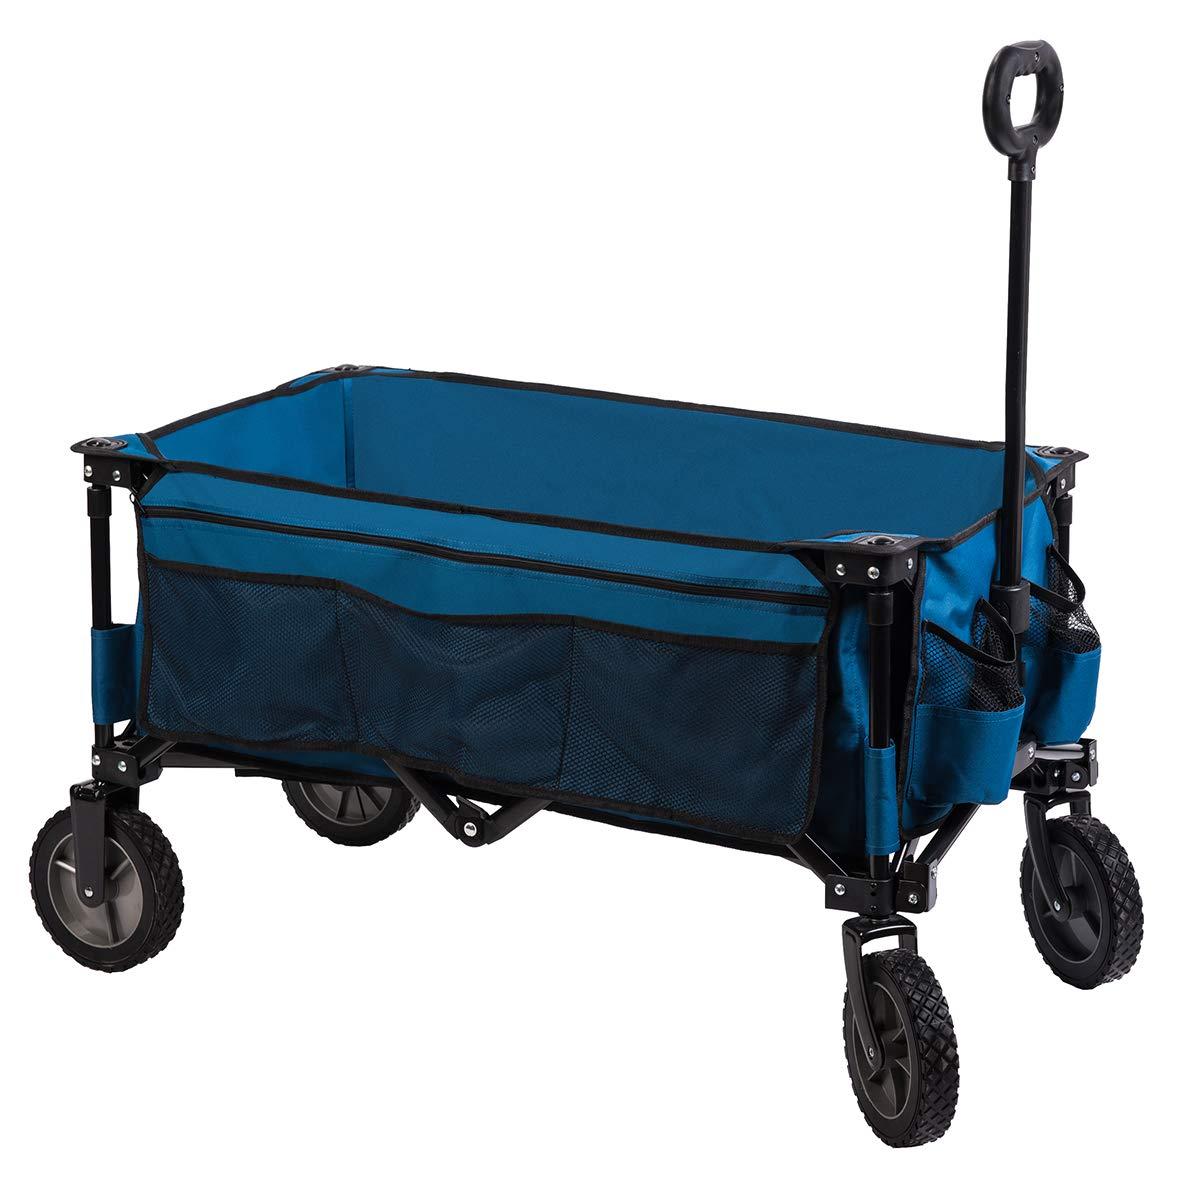 Timber Ridge Camping Wagon Folding Garden Cart Collapsible Utility Shopping Trolley, Side Bag, Blue TR217270BEB